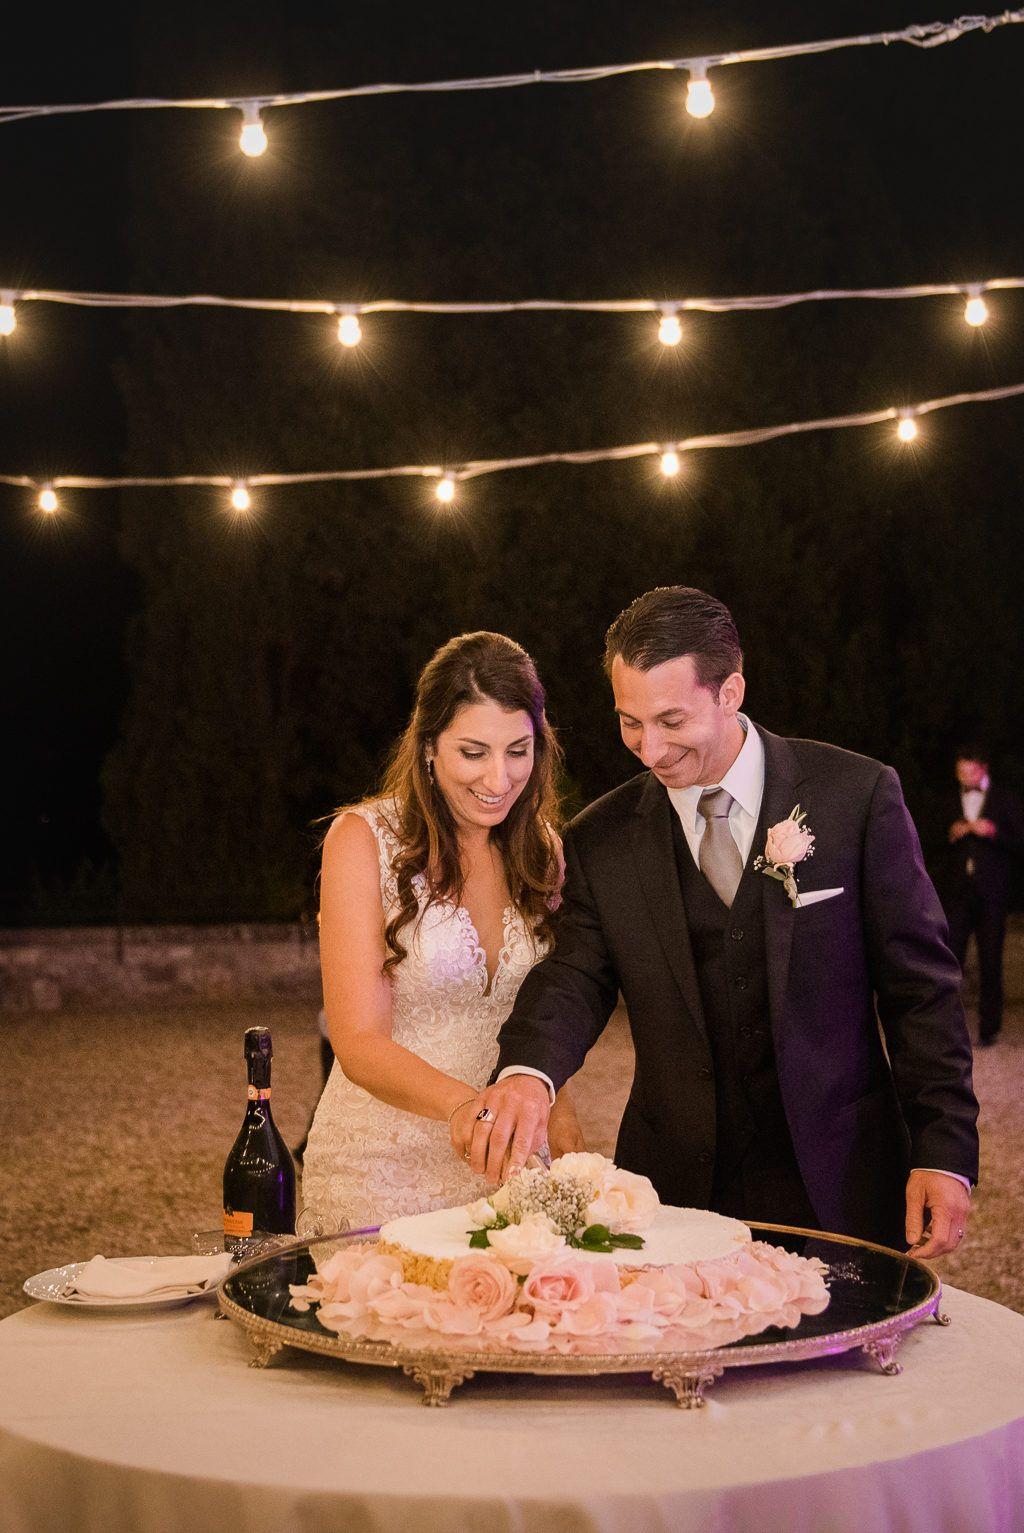 Musica Matrimonio Toscana : Vicchiomaggio wedding u2013 greve in chianti tuscany our strings of